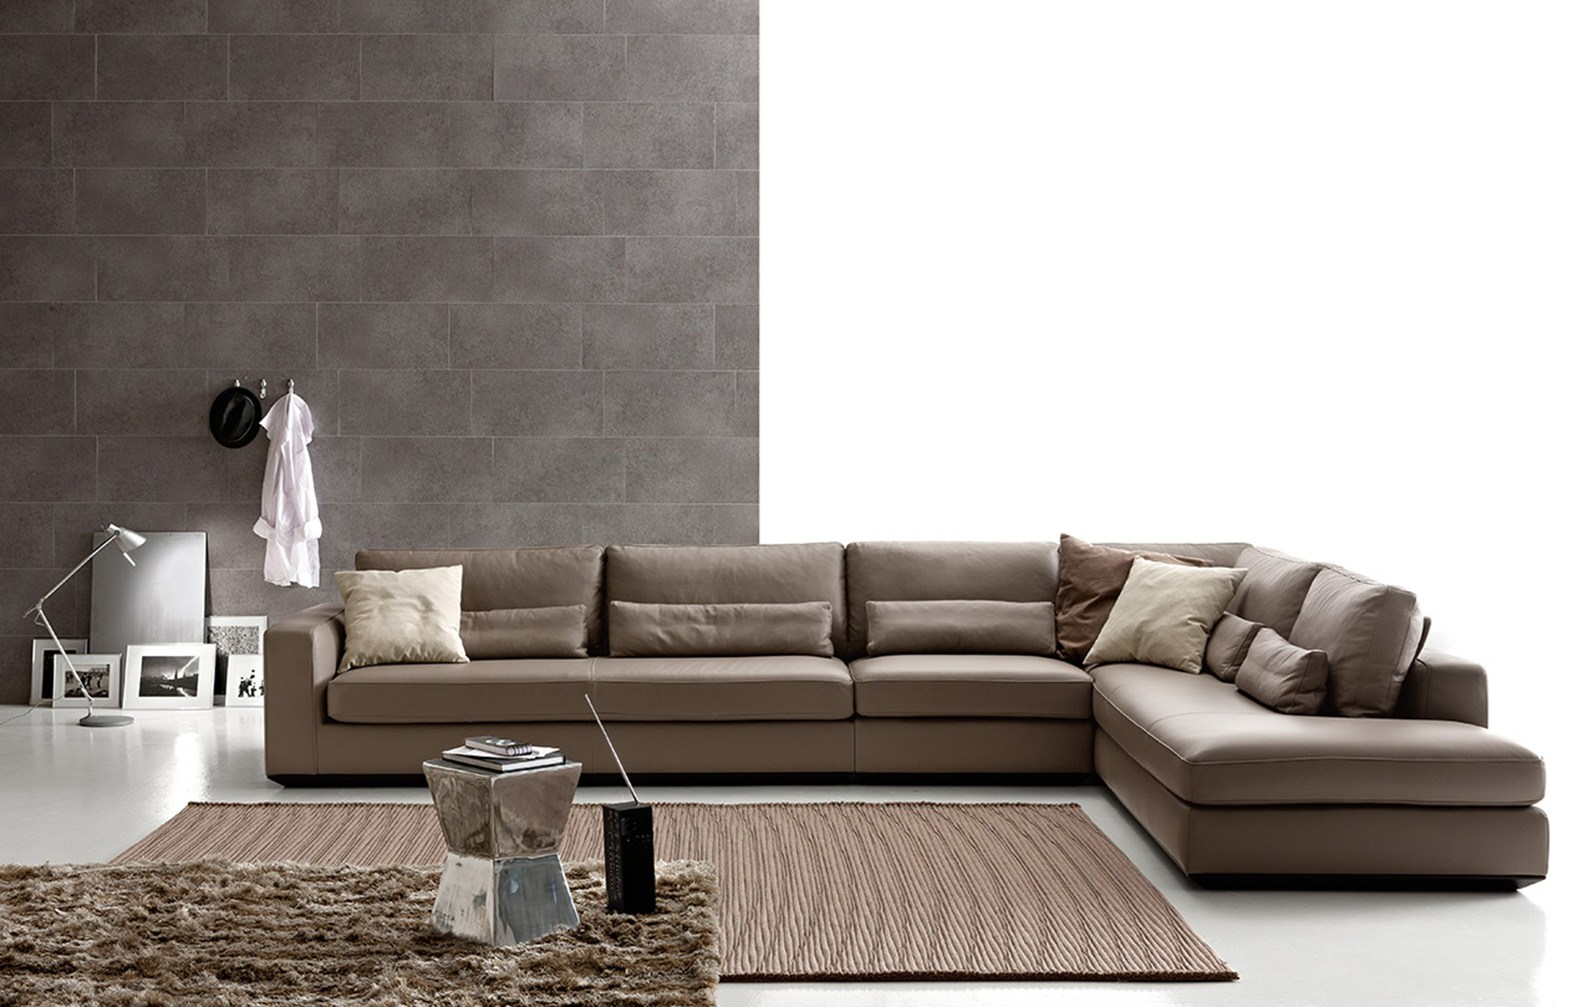 corner sectional leather sofa loman leather by ditre italia design stefano spessotto lorella